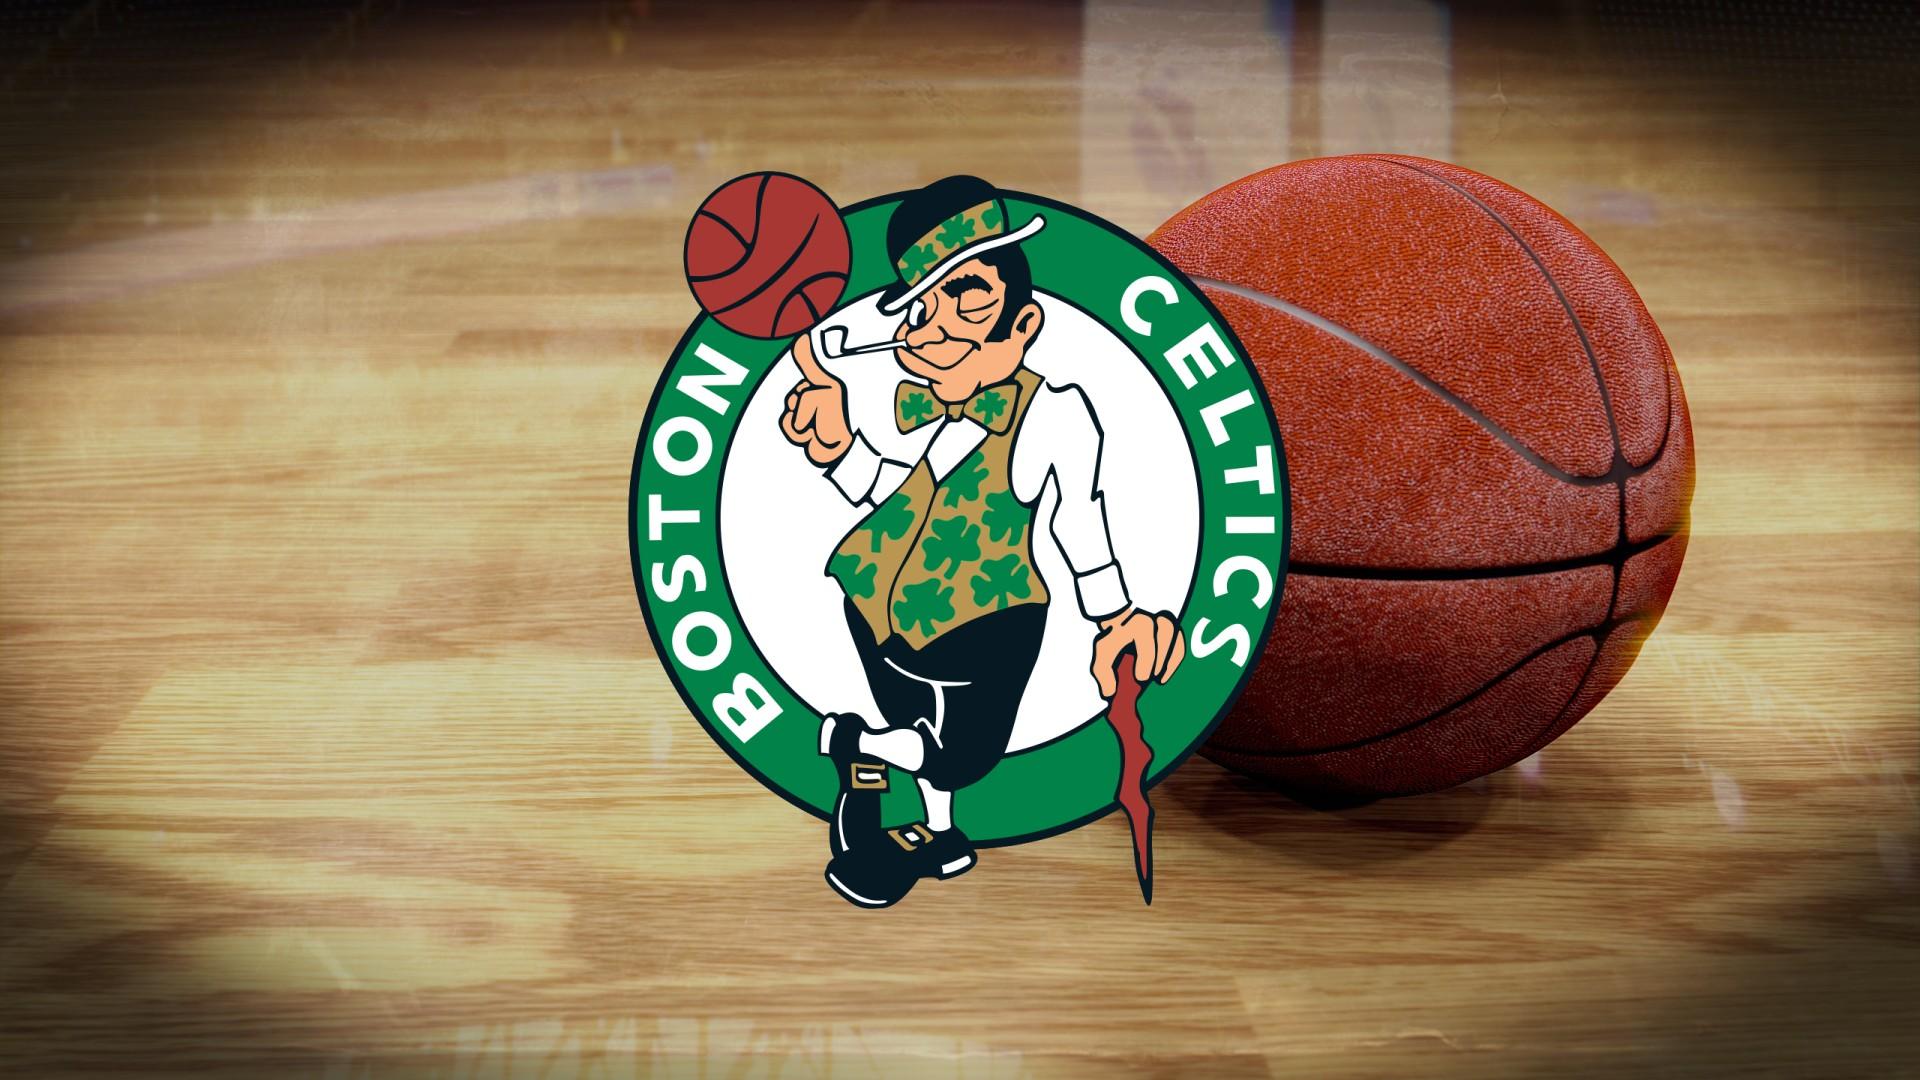 Hd Celtics Wallpapers With High-resolution Pixel - Boston Celtics Logo Png , HD Wallpaper & Backgrounds